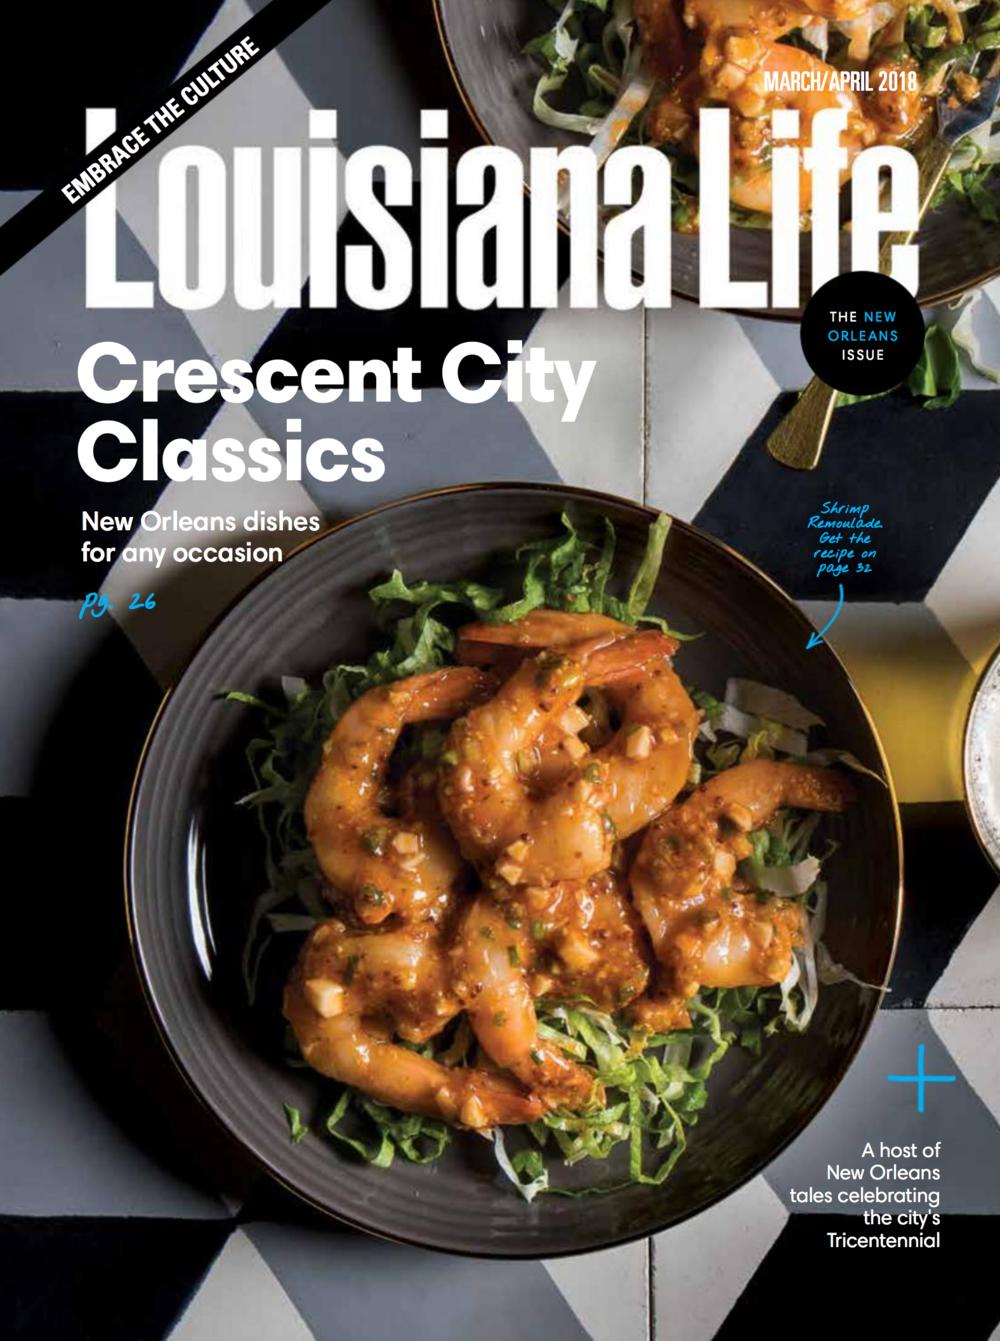 http://www.myneworleans.com/Louisiana-Life/March-April-2018/Crescent-City-Classics/